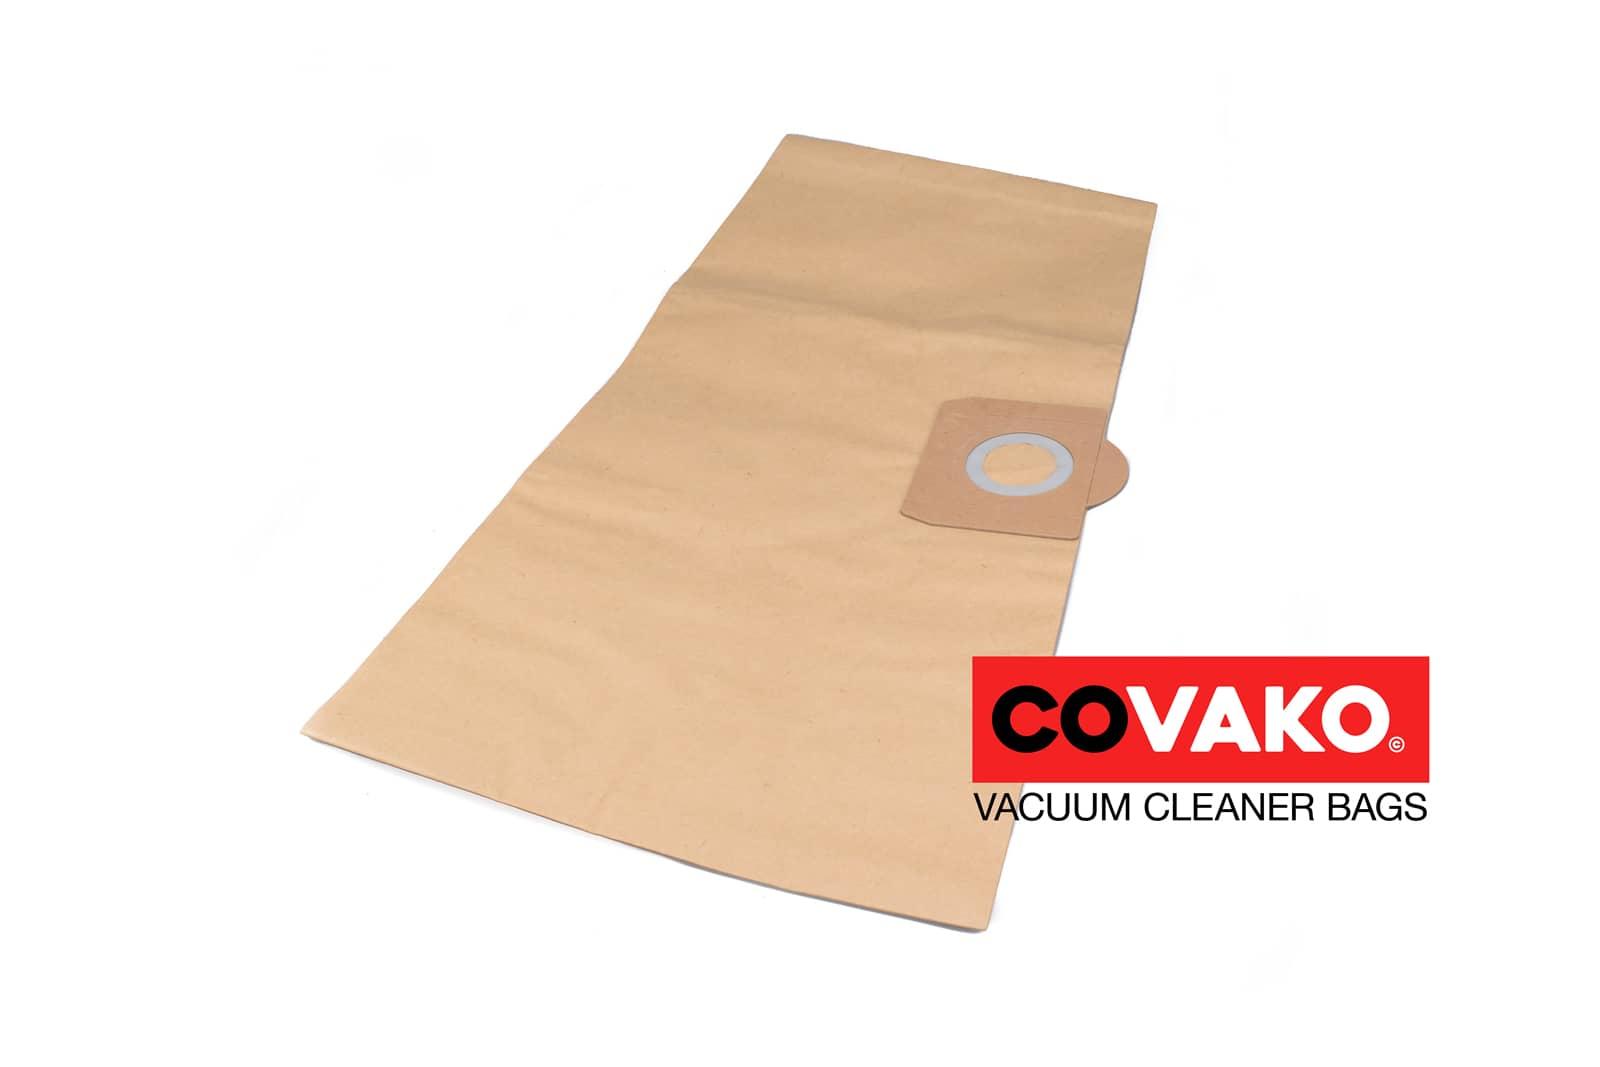 Wirbel 819 / Papier - Wirbel sacs d'aspirateur